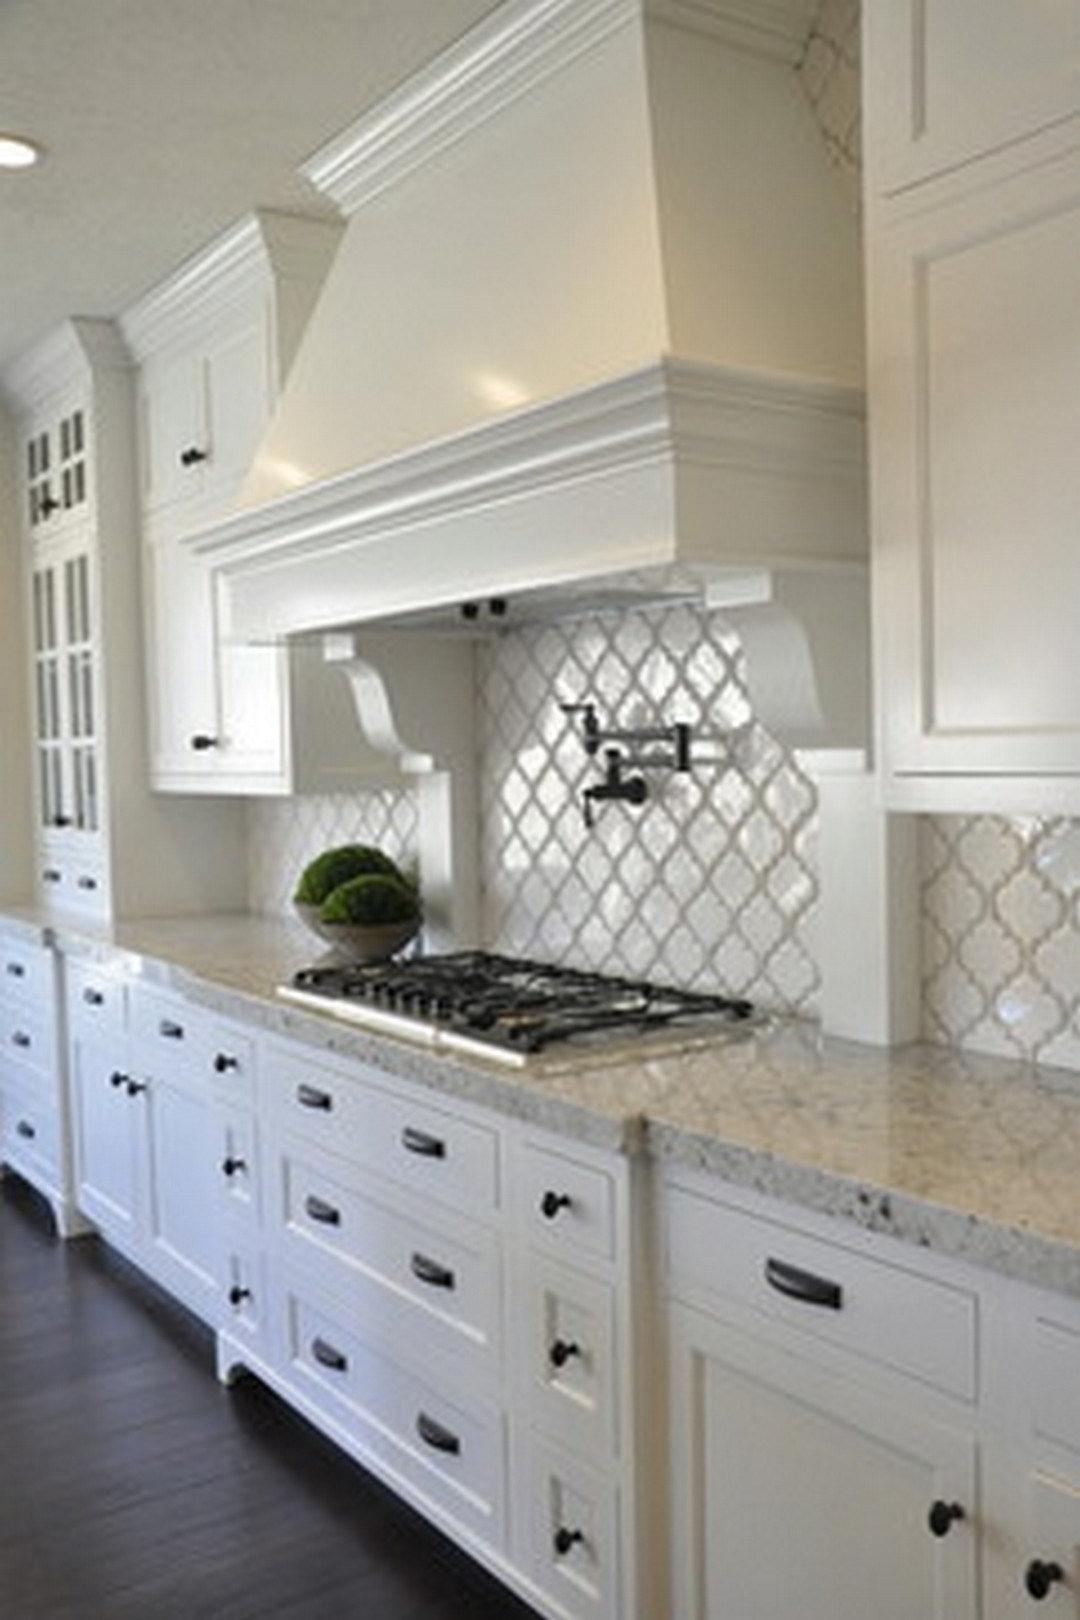 53 pretty white kitchen design ideas | pinterest - keuken